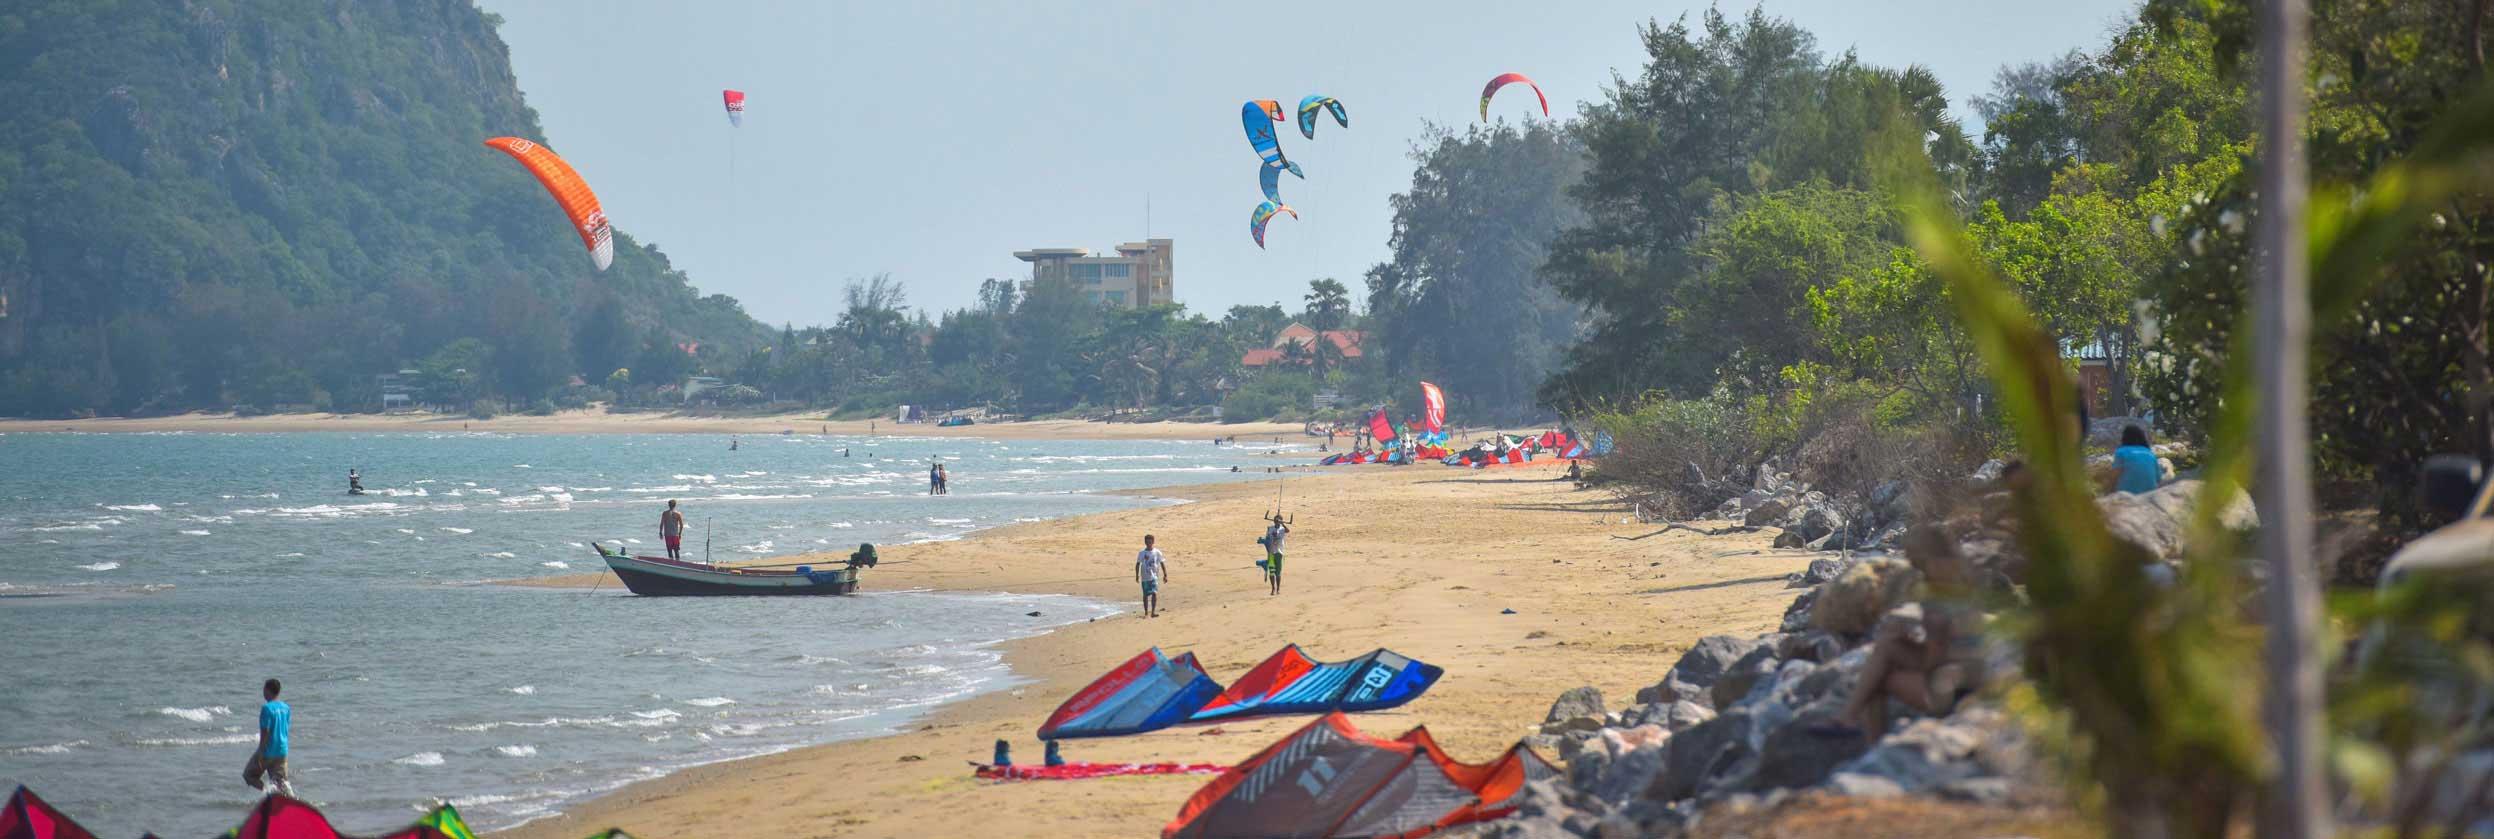 Khao-Kalok-beach-Thailand